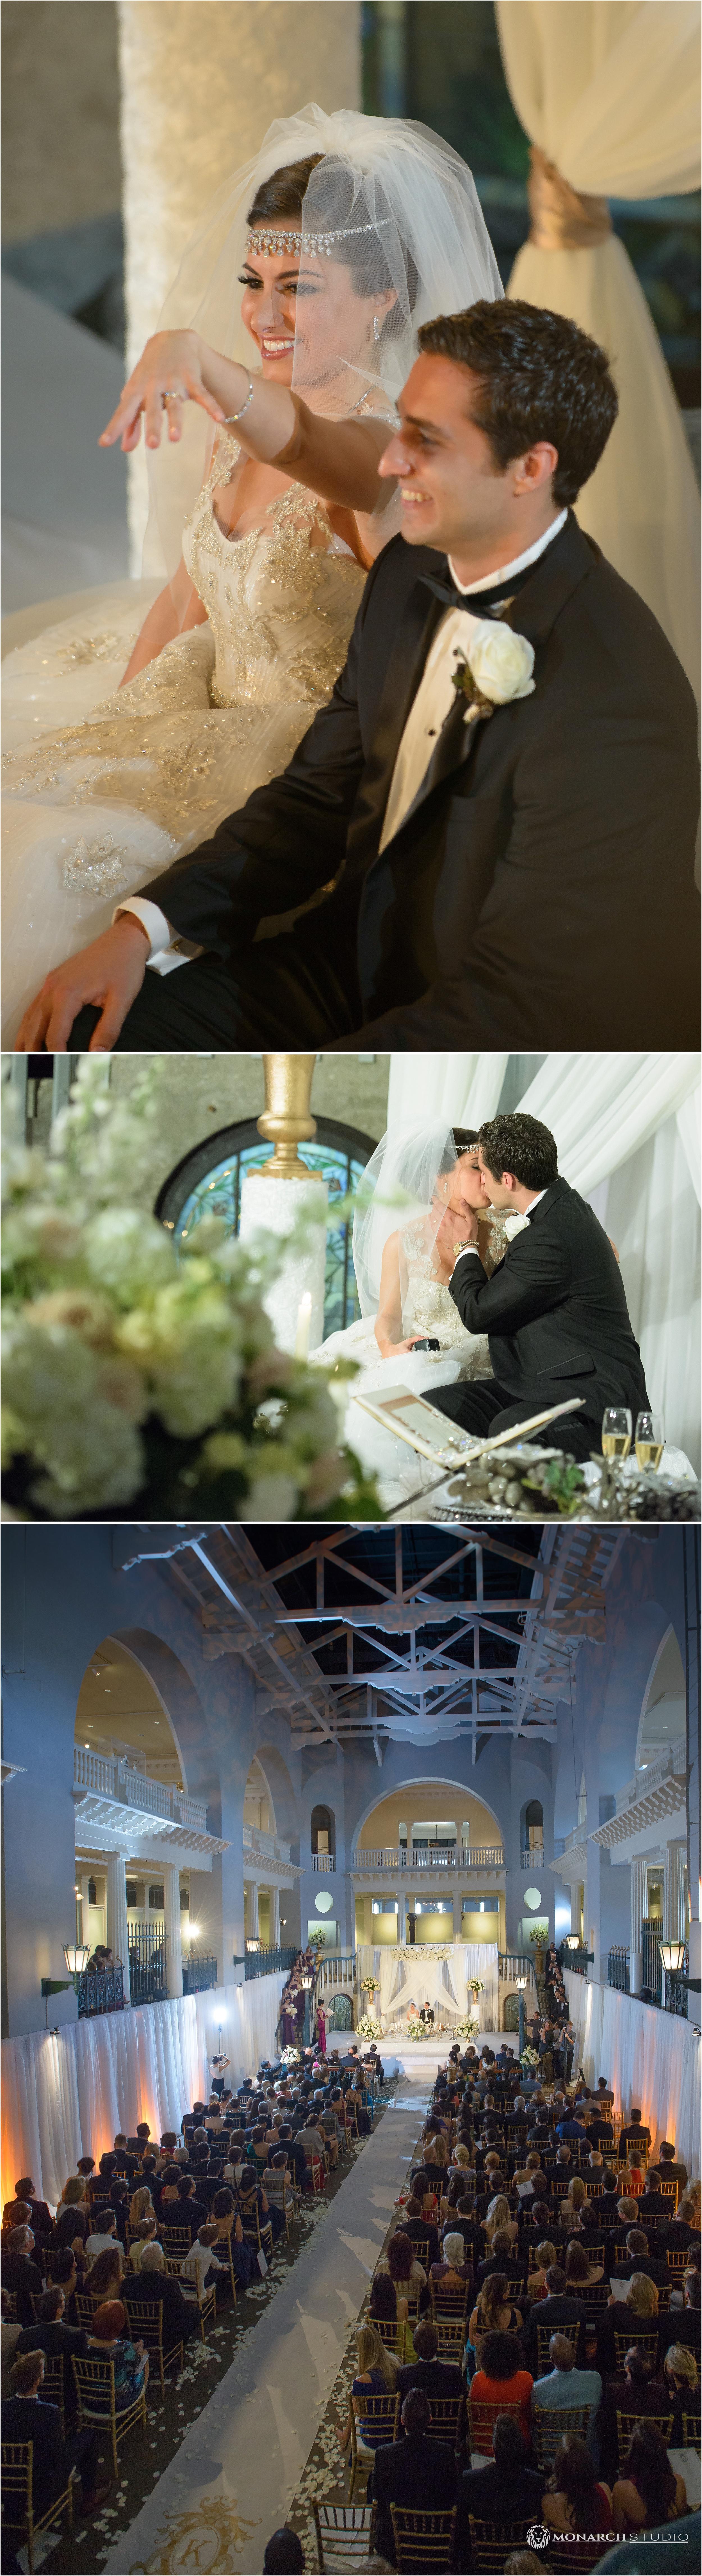 Persian-Aghd-Wedding-Photographer- سفره عقد-034.jpg